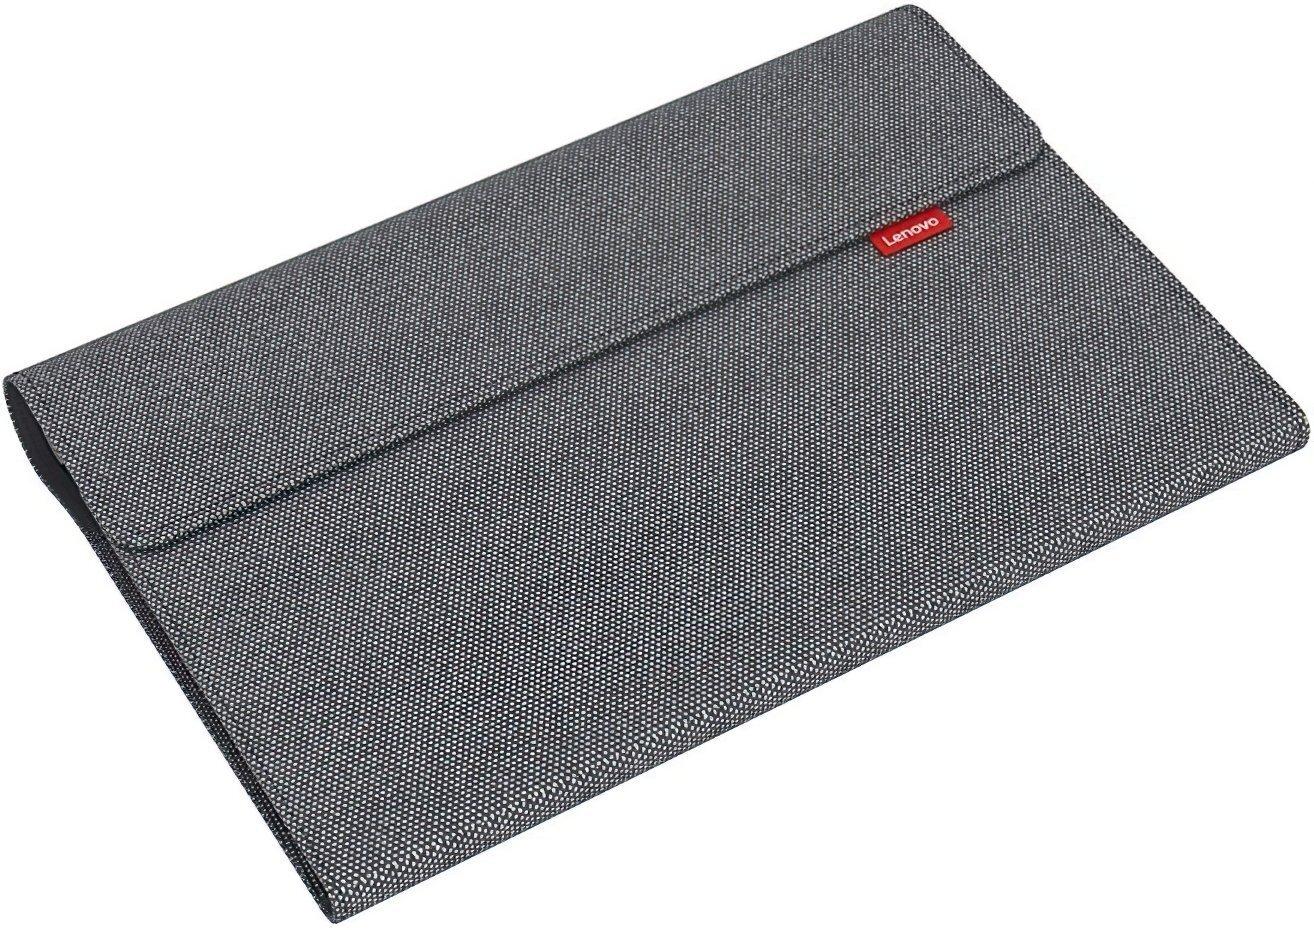 Чехол Lenovo для планшета Yoga Smart Tab, серый + защитная пленка (ZG38C02854) фото